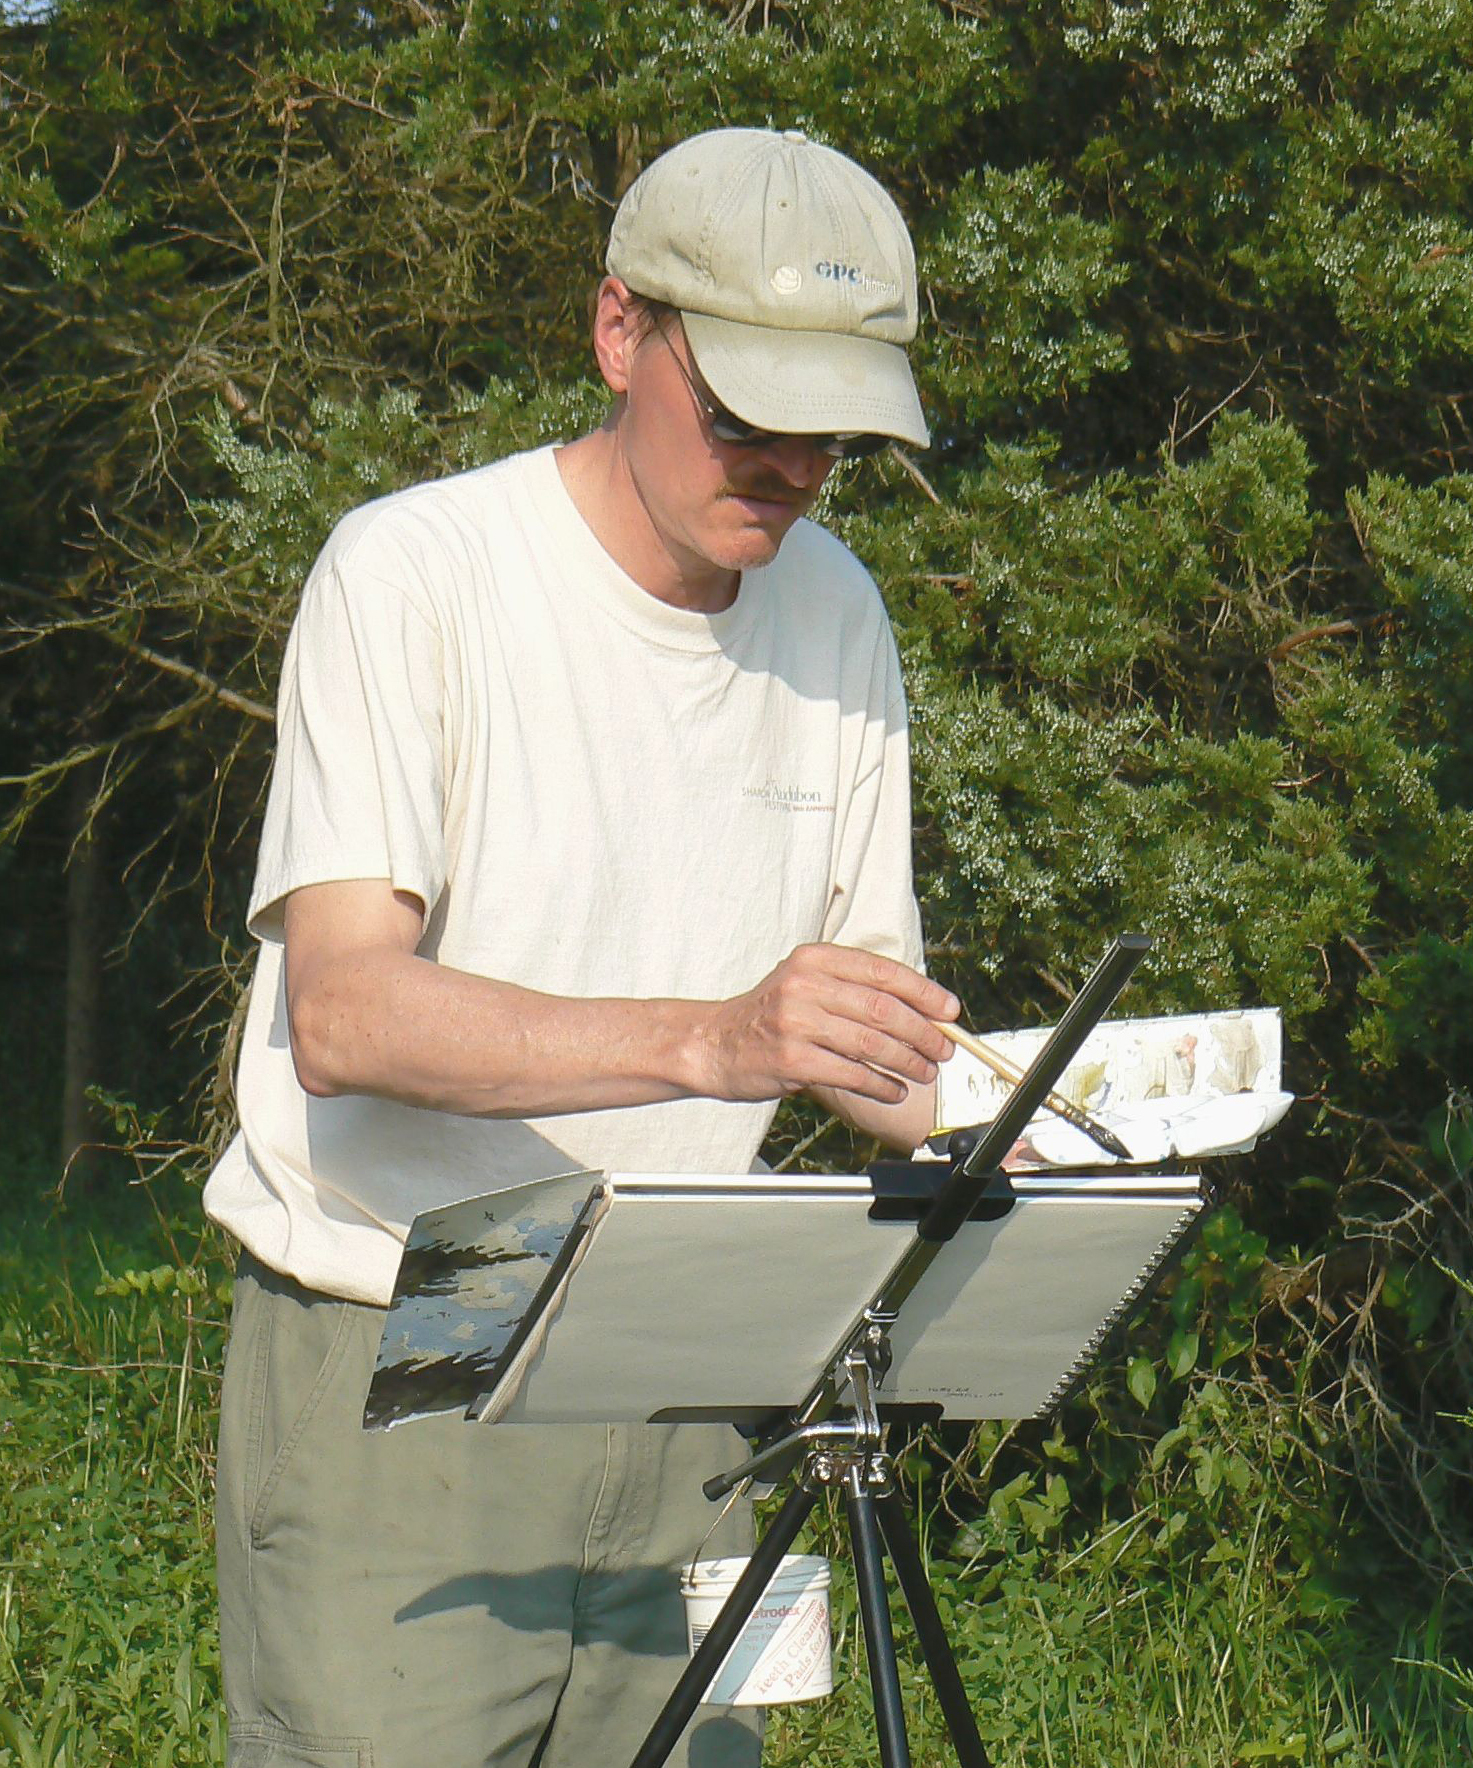 Barry Van Dusen painting in the field